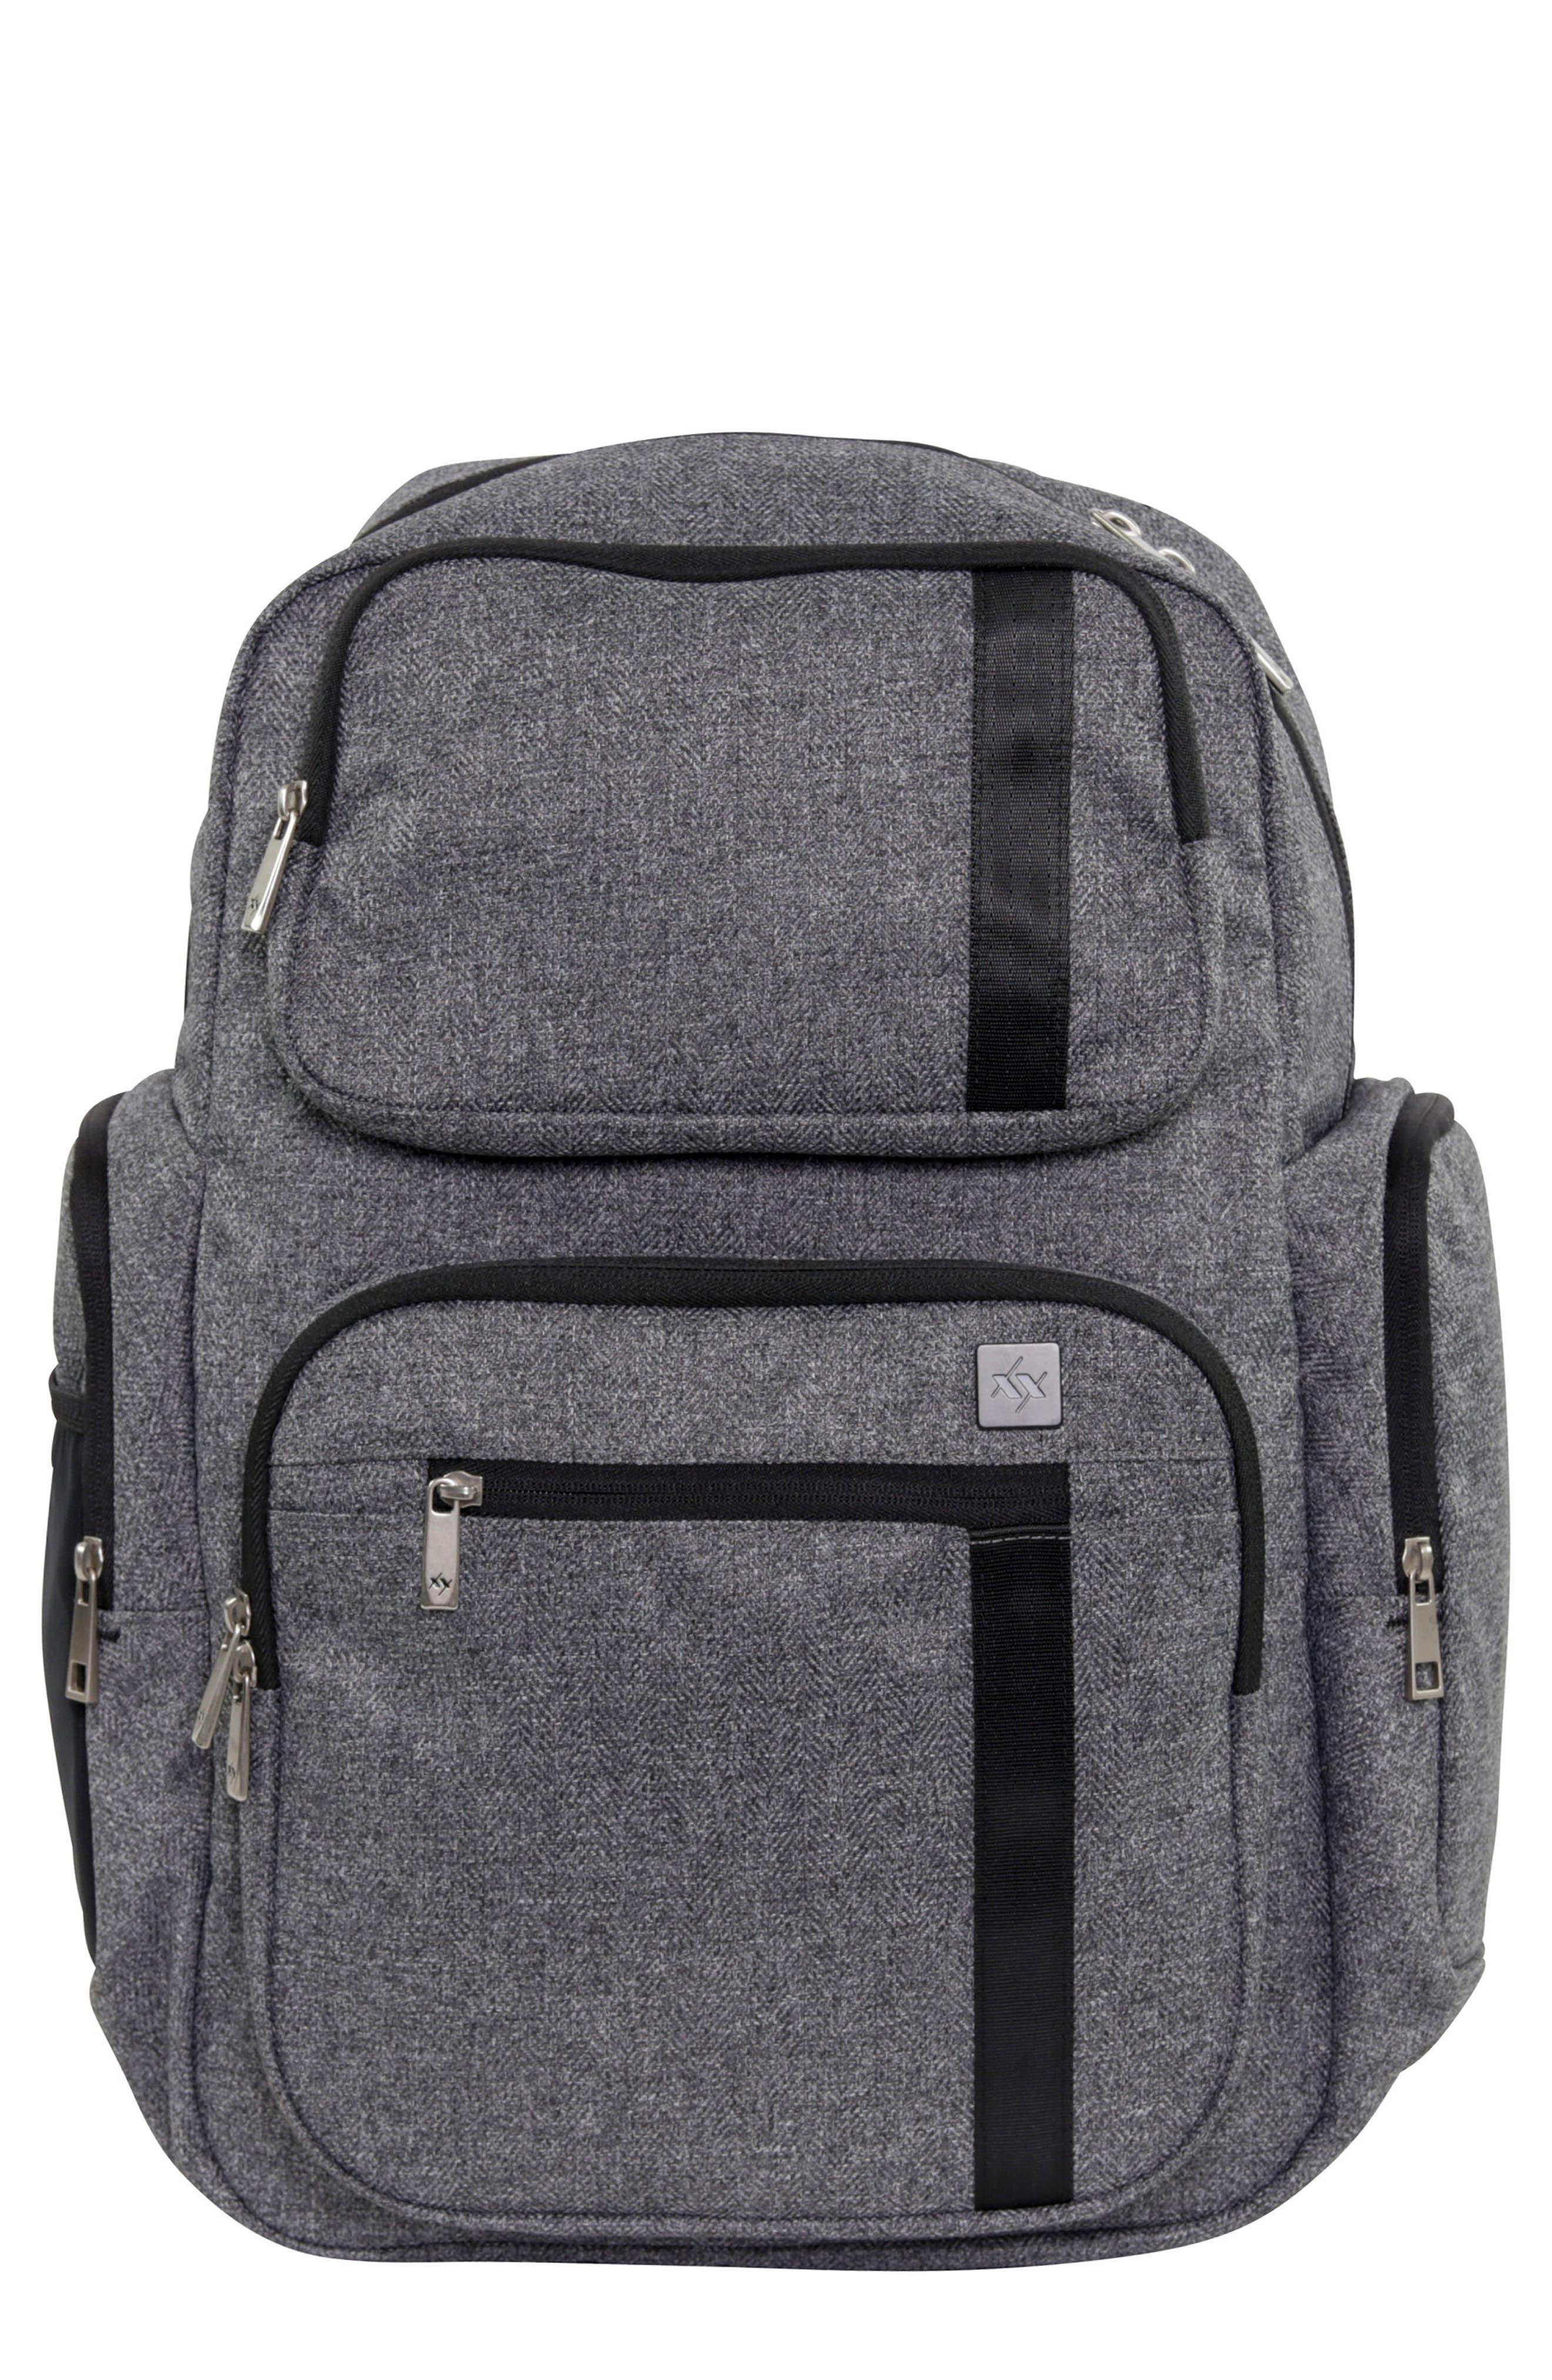 XY Vector Diaper Backpack,                             Main thumbnail 1, color,                             GRAY MATTER